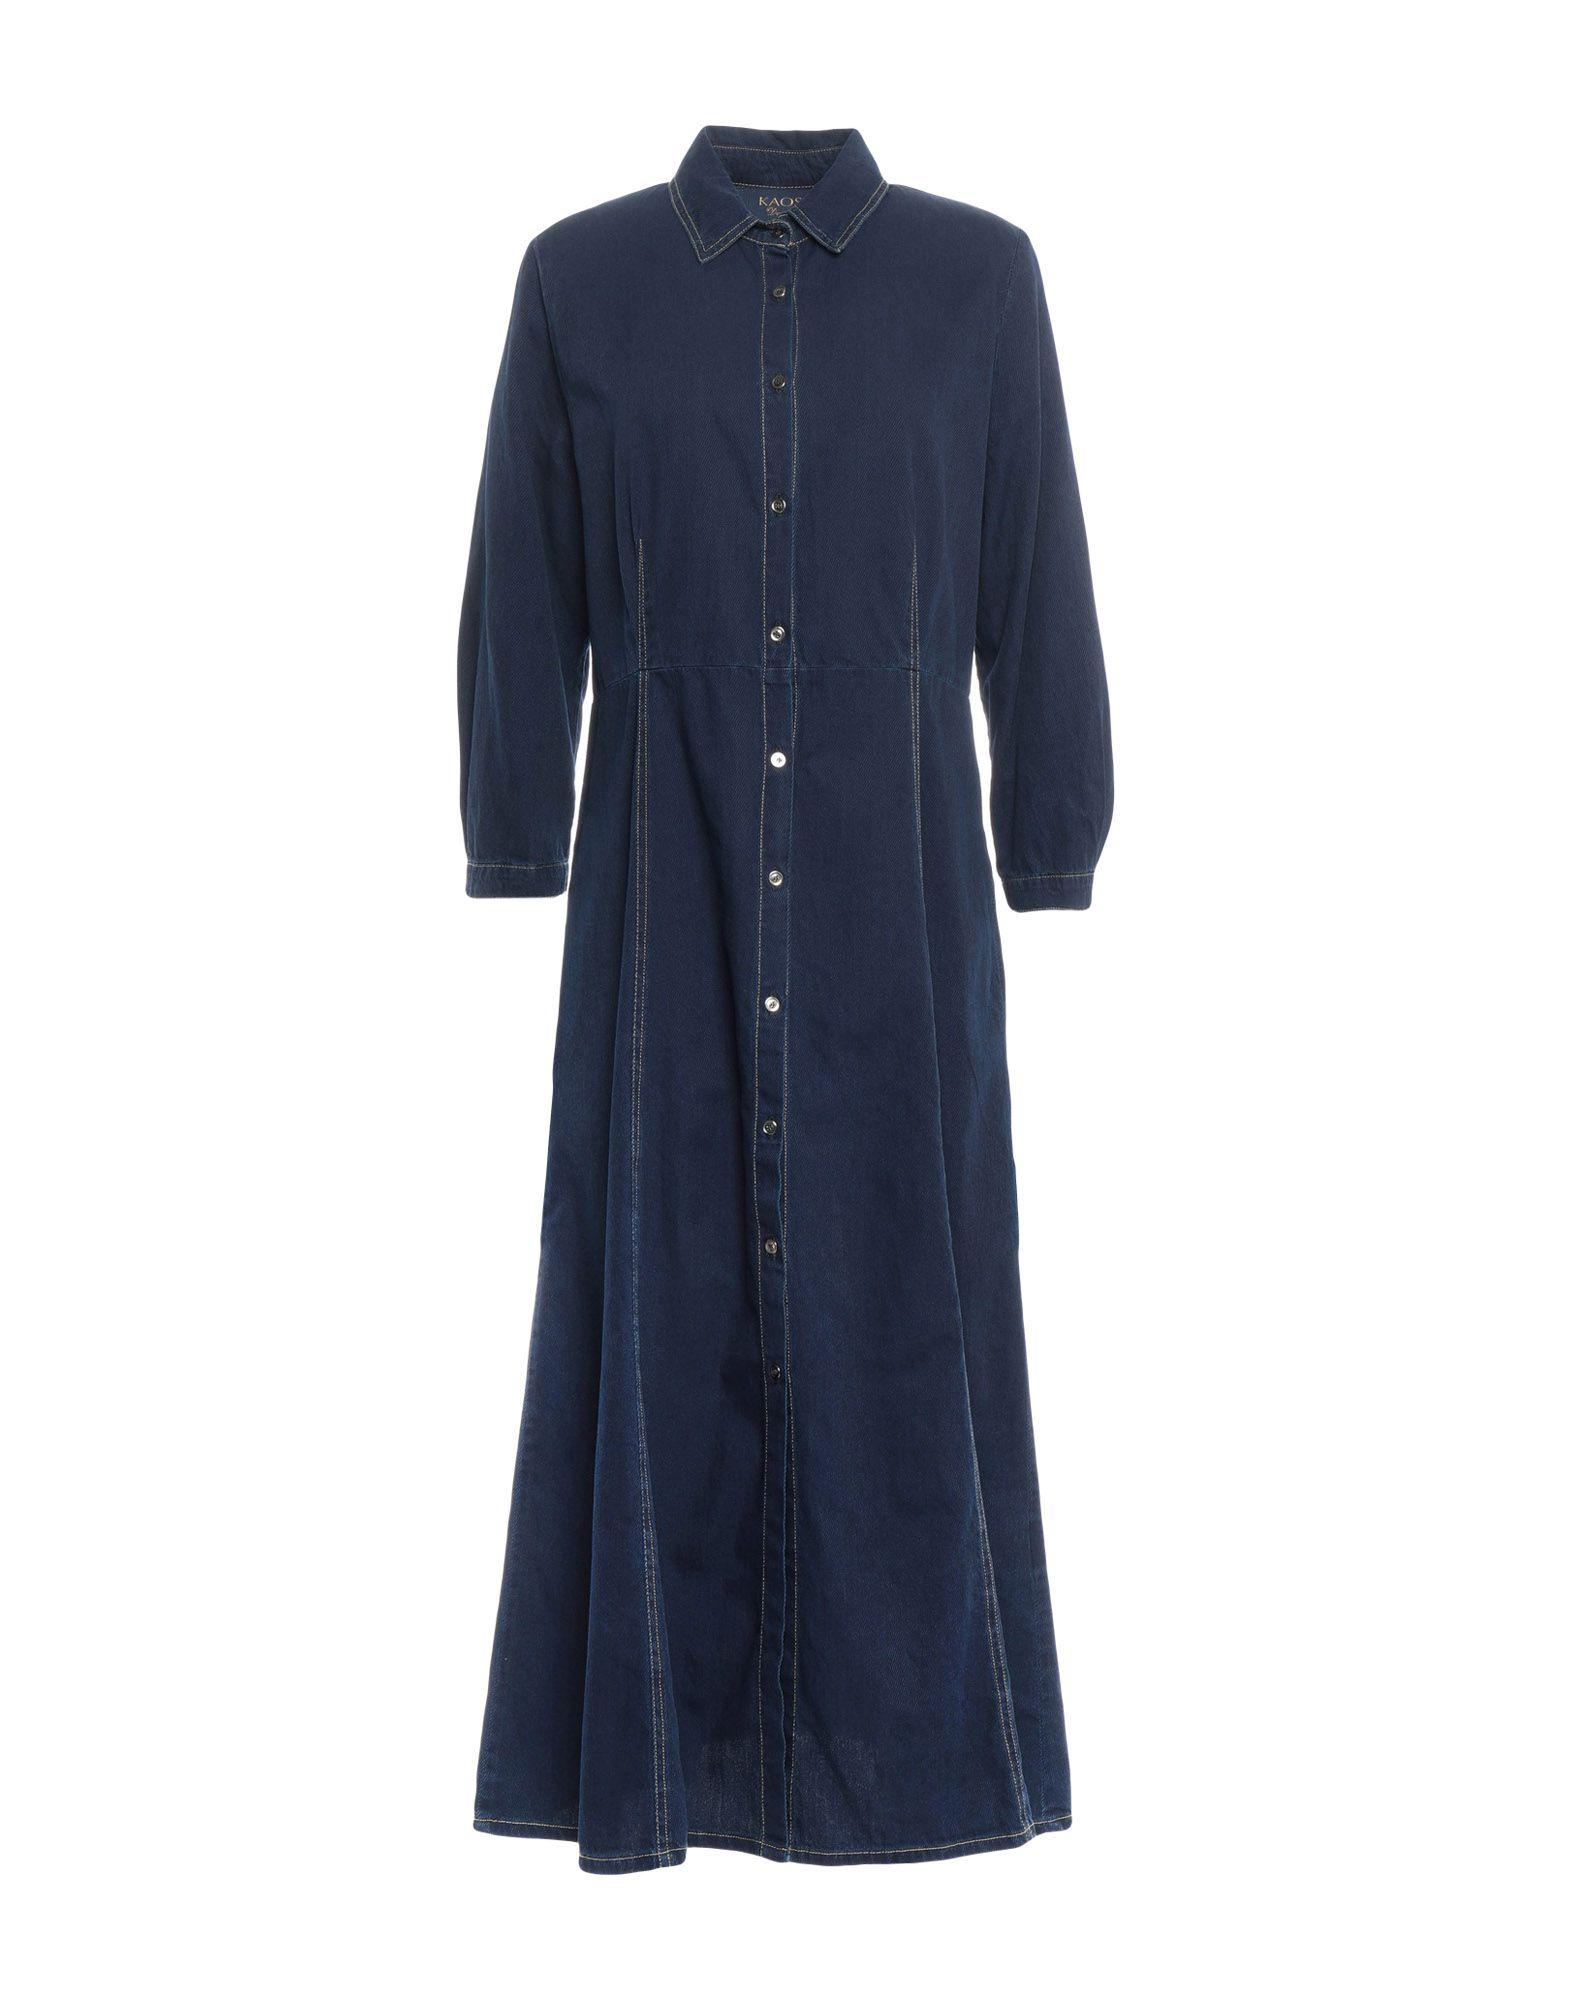 KAOS Платье длиной 3/4 free shipping 10pcs 100% new ta8127f